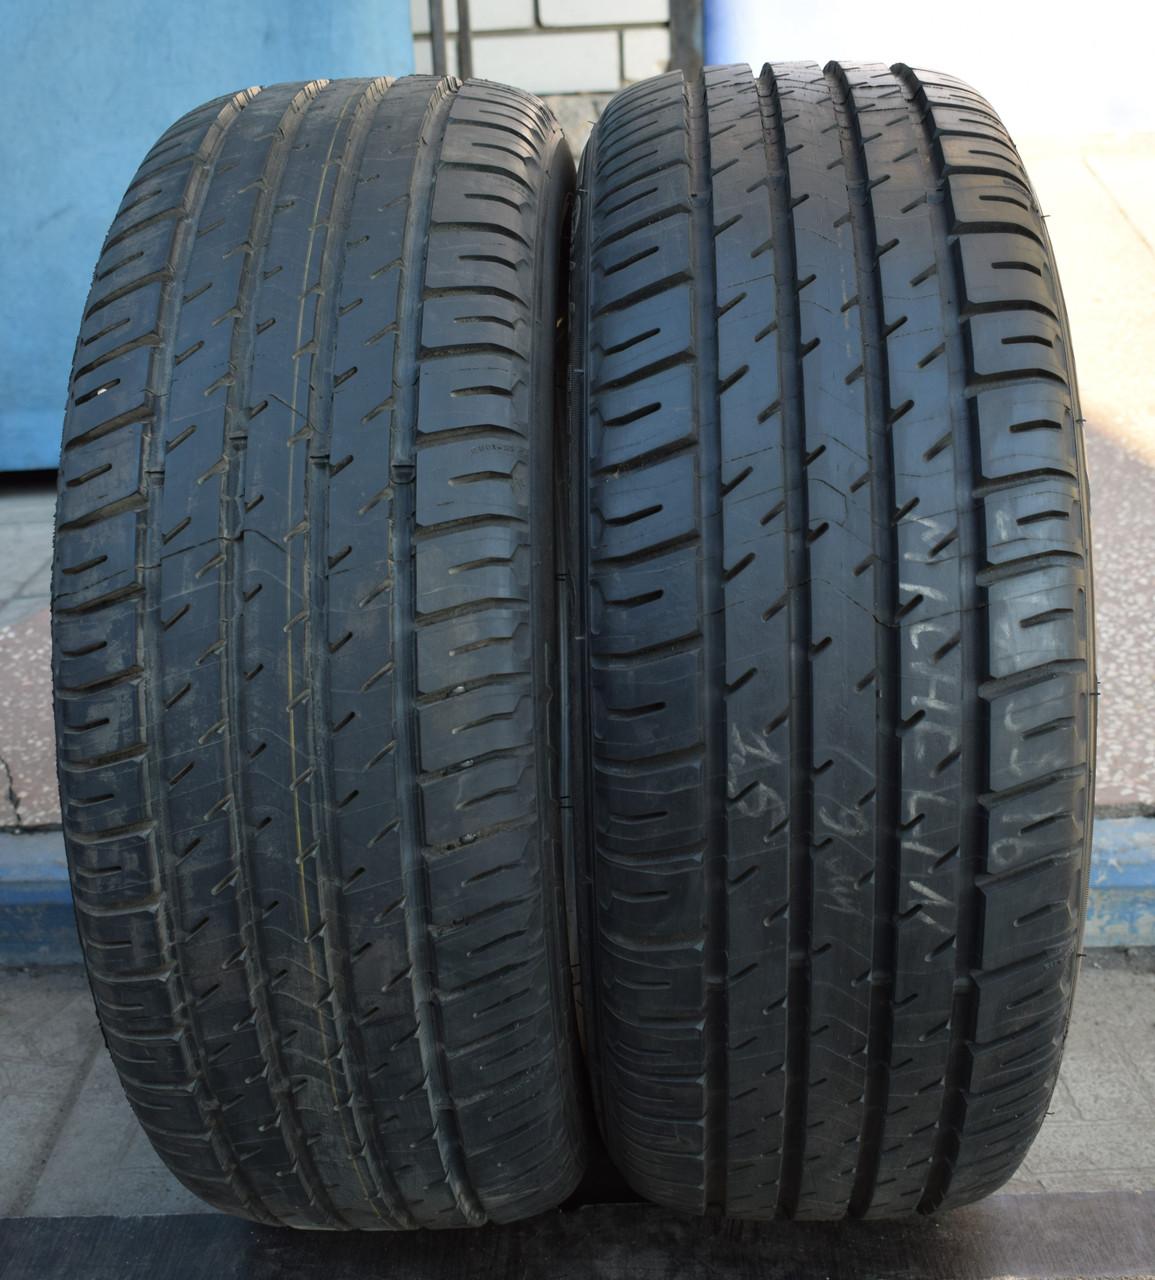 Летние шины б/у 215/55 R16 Michelin Pilot HX, 8 мм, пара